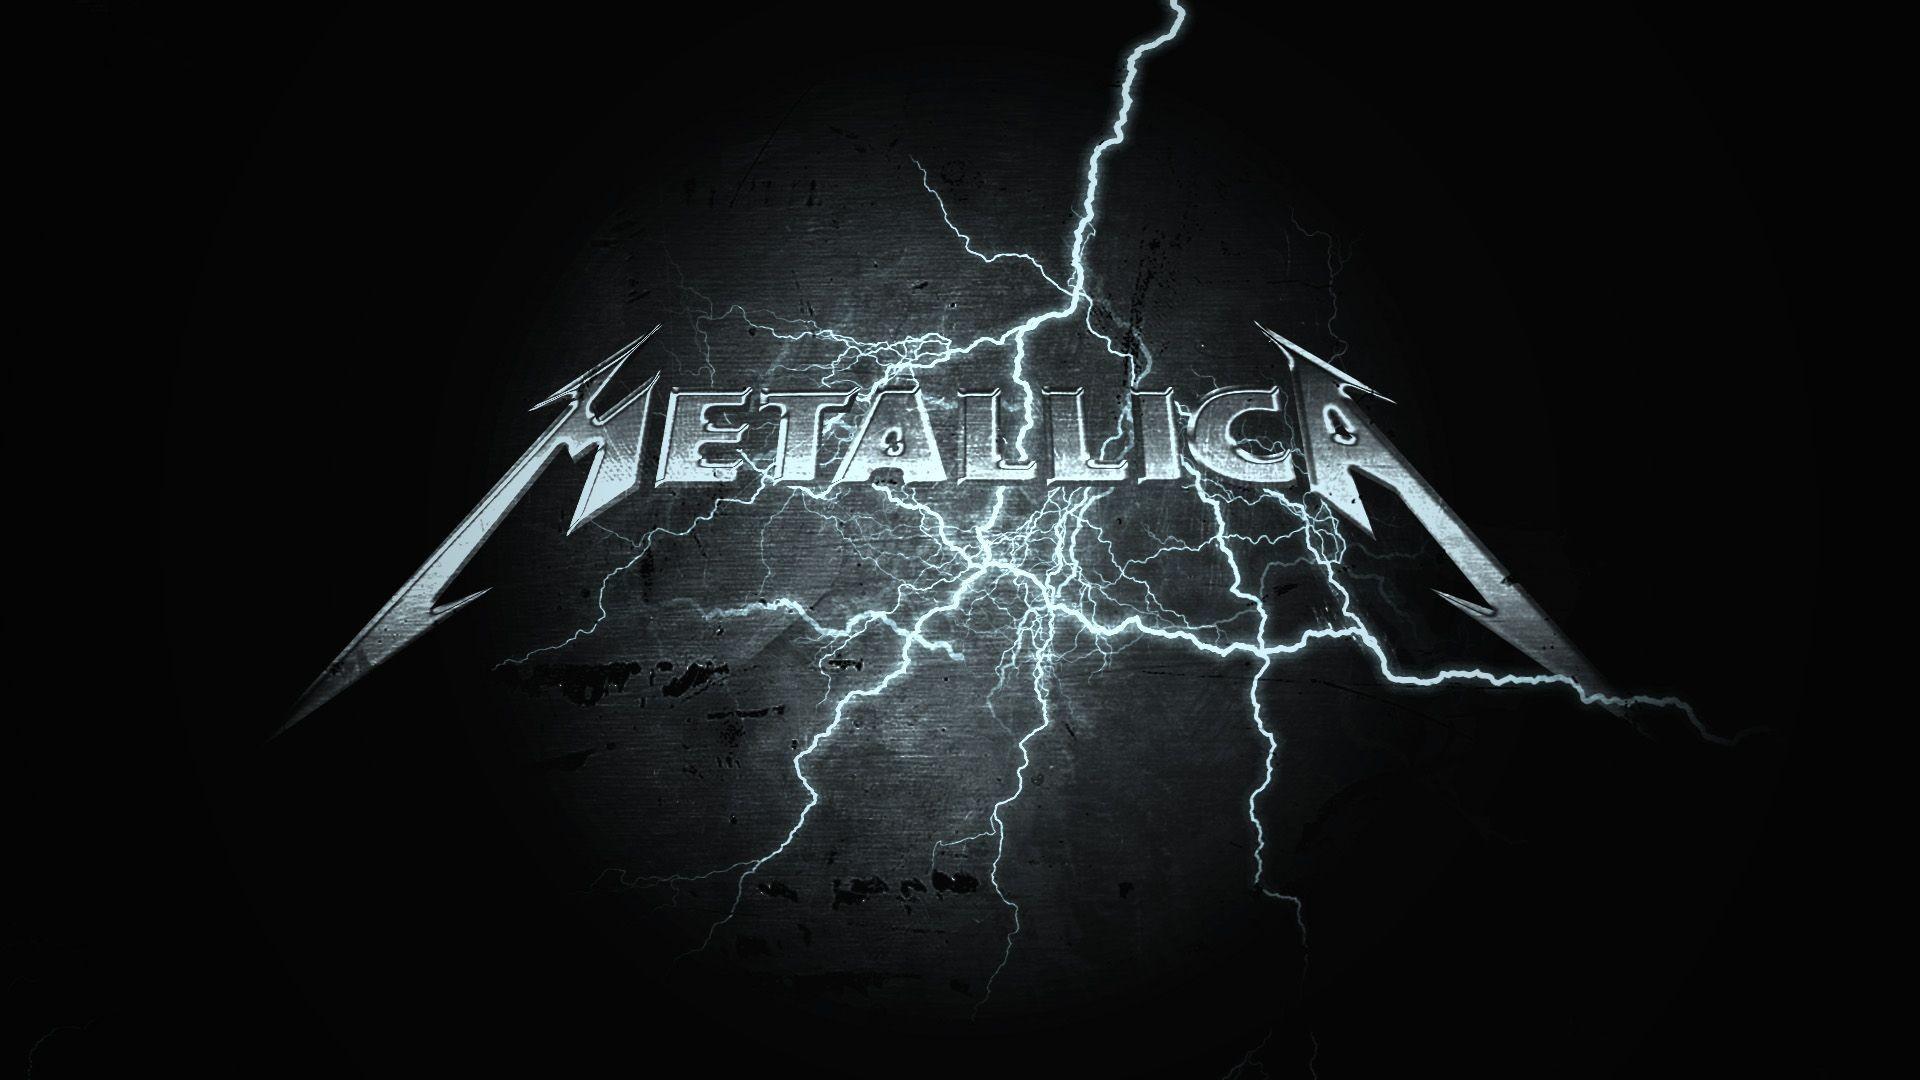 Metallica logo wallpaper wallpapertag - Metallica wallpaper ...